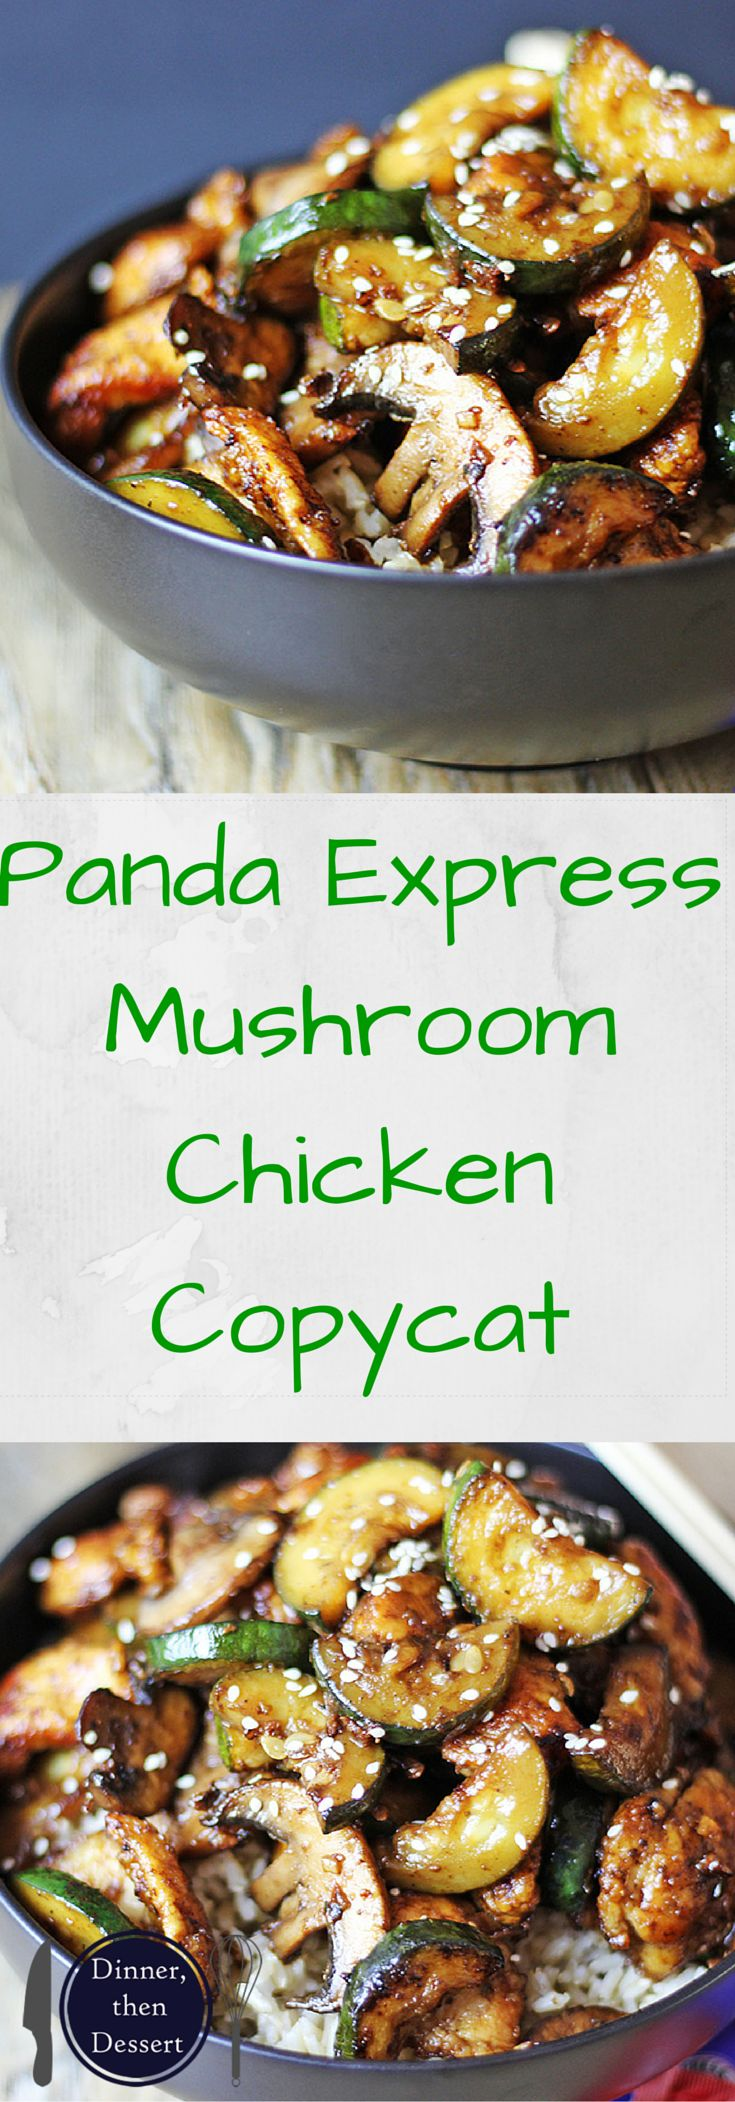 Panda Express Zucchini and Mushroom Chicken (copycat)